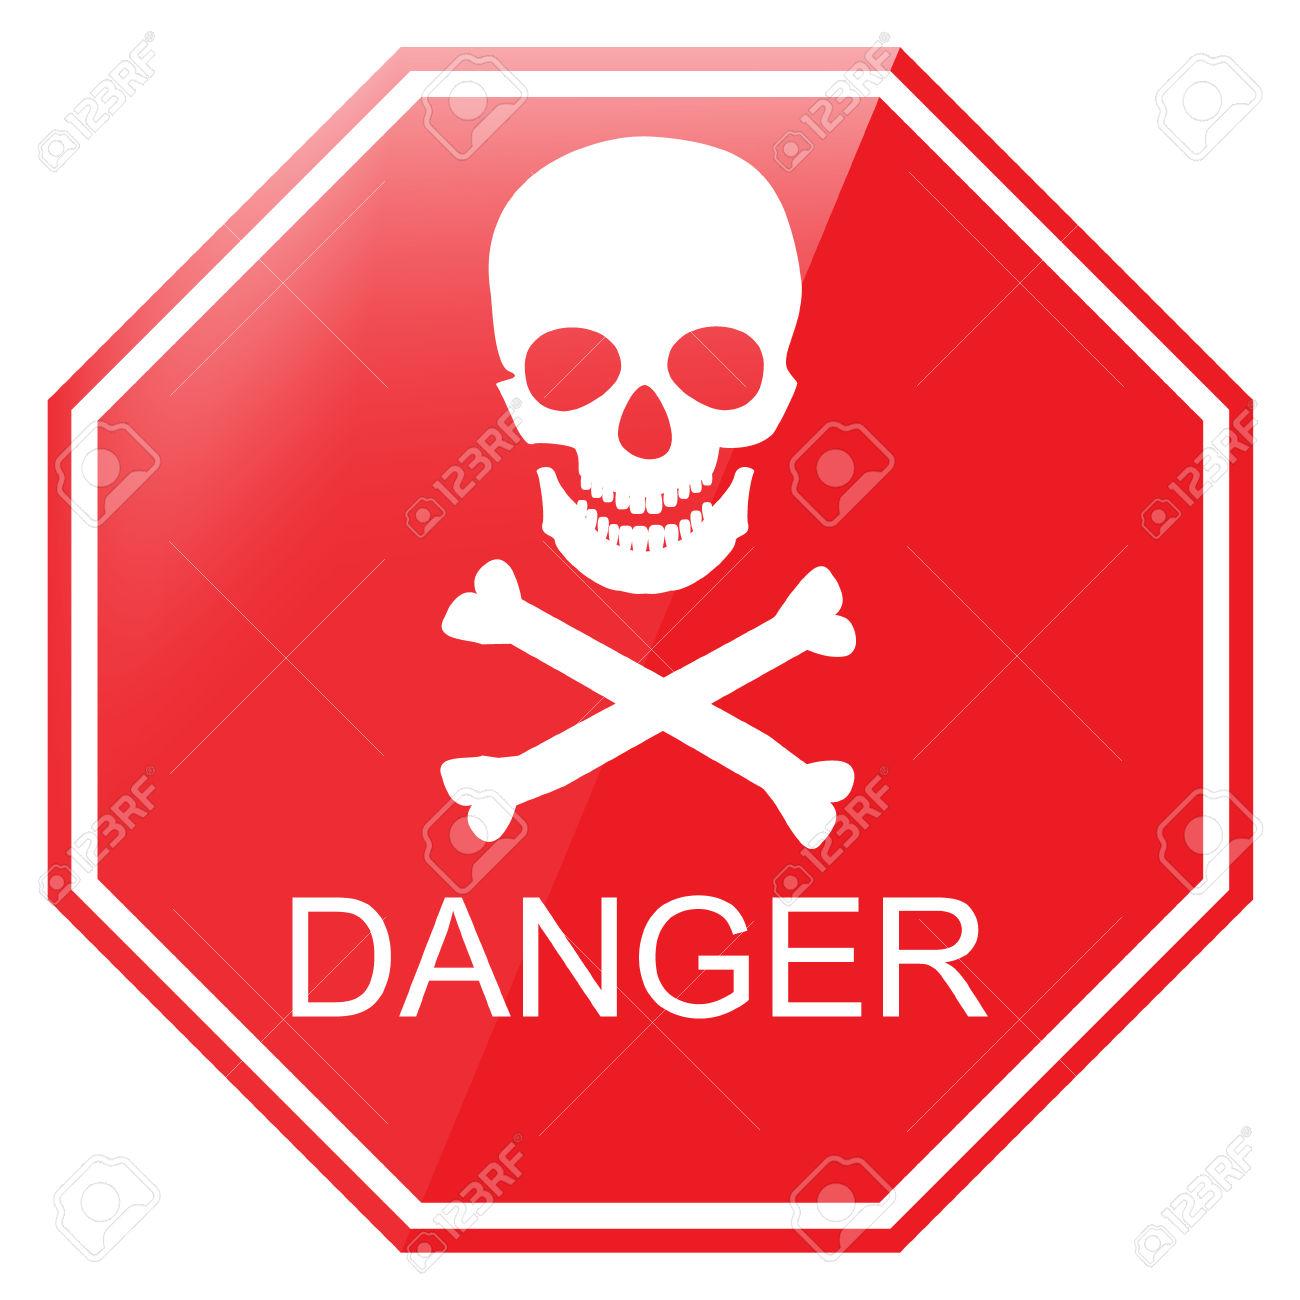 Vector Illustration Red Octagon Danger Sign With Skull Symbol.